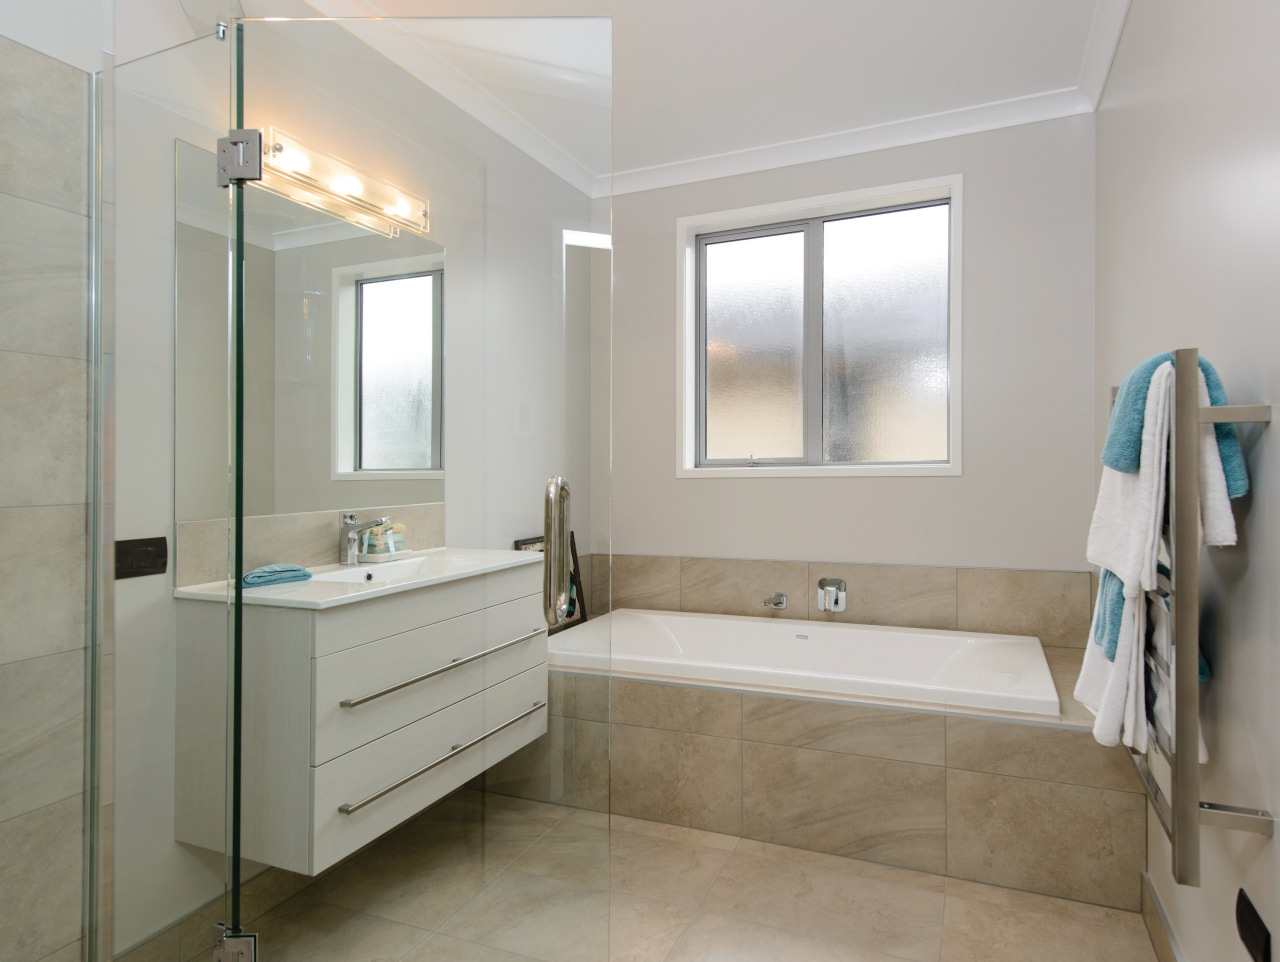 GJ Gardner Homes show home bathroom bathroom, bathroom accessory, bathroom cabinet, floor, home, interior design, real estate, room, sink, tile, gray